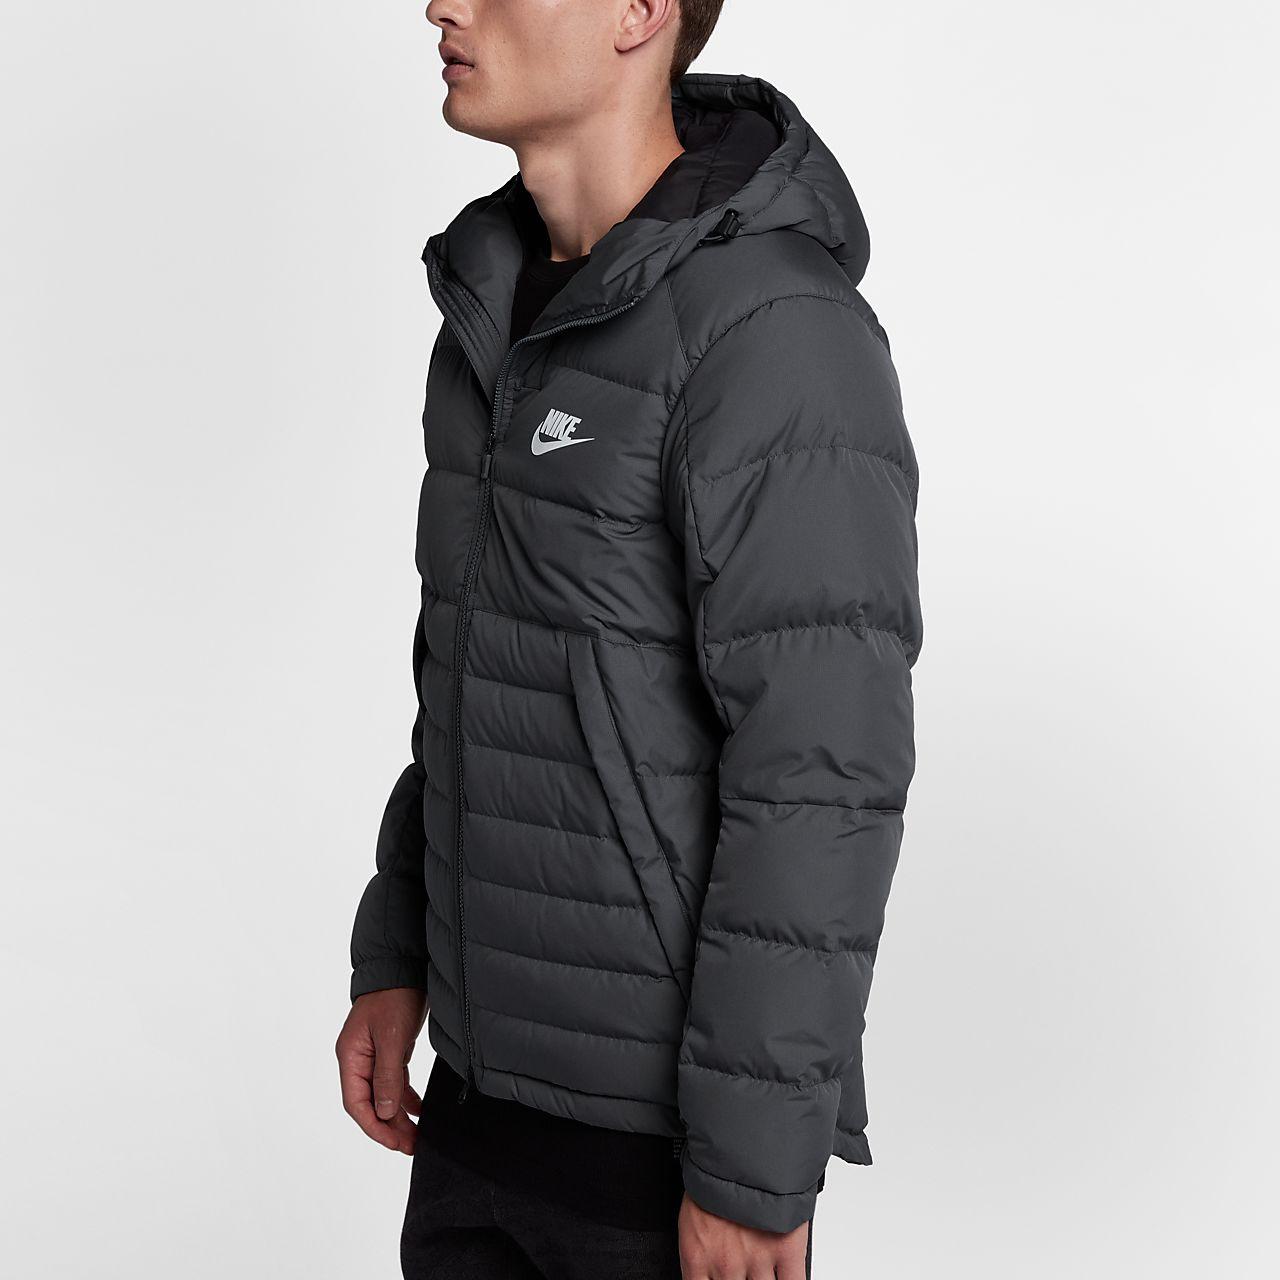 Nike Down Jacket Mens unit4motors.co.uk 17b3ae2dd7a1